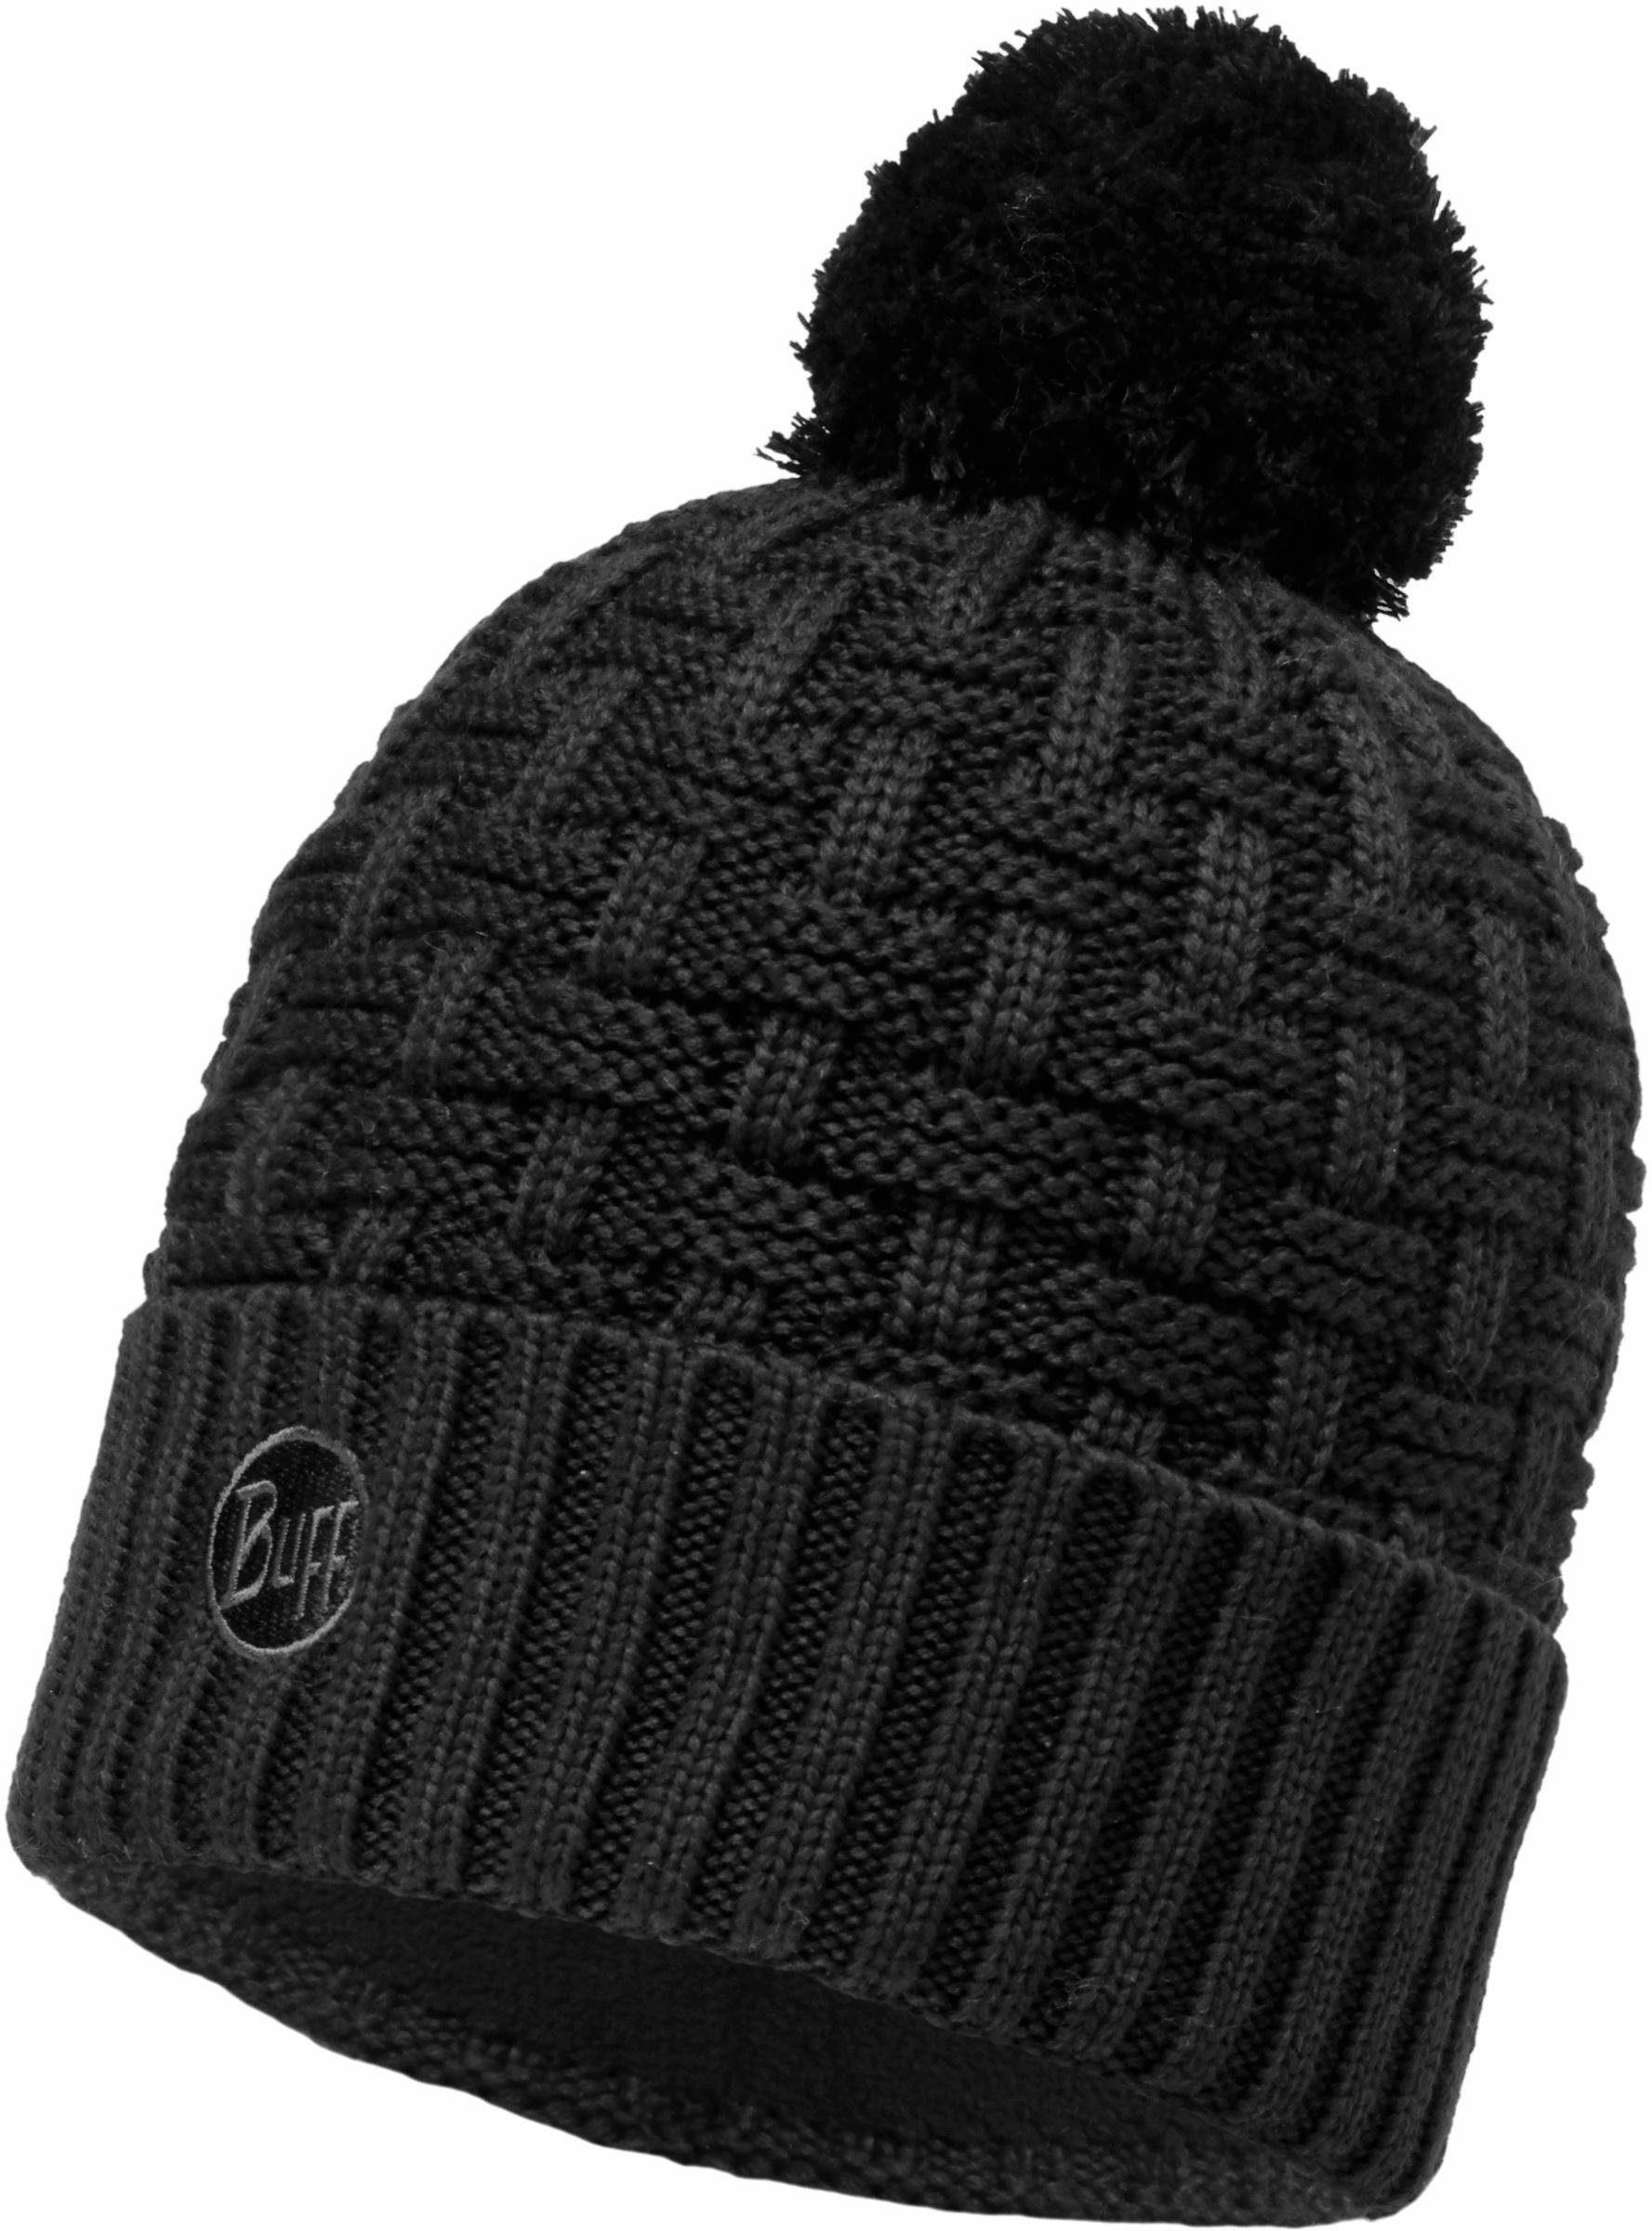 Buff Bommelmütze »Knitted Polar Fleece Hat Buff«